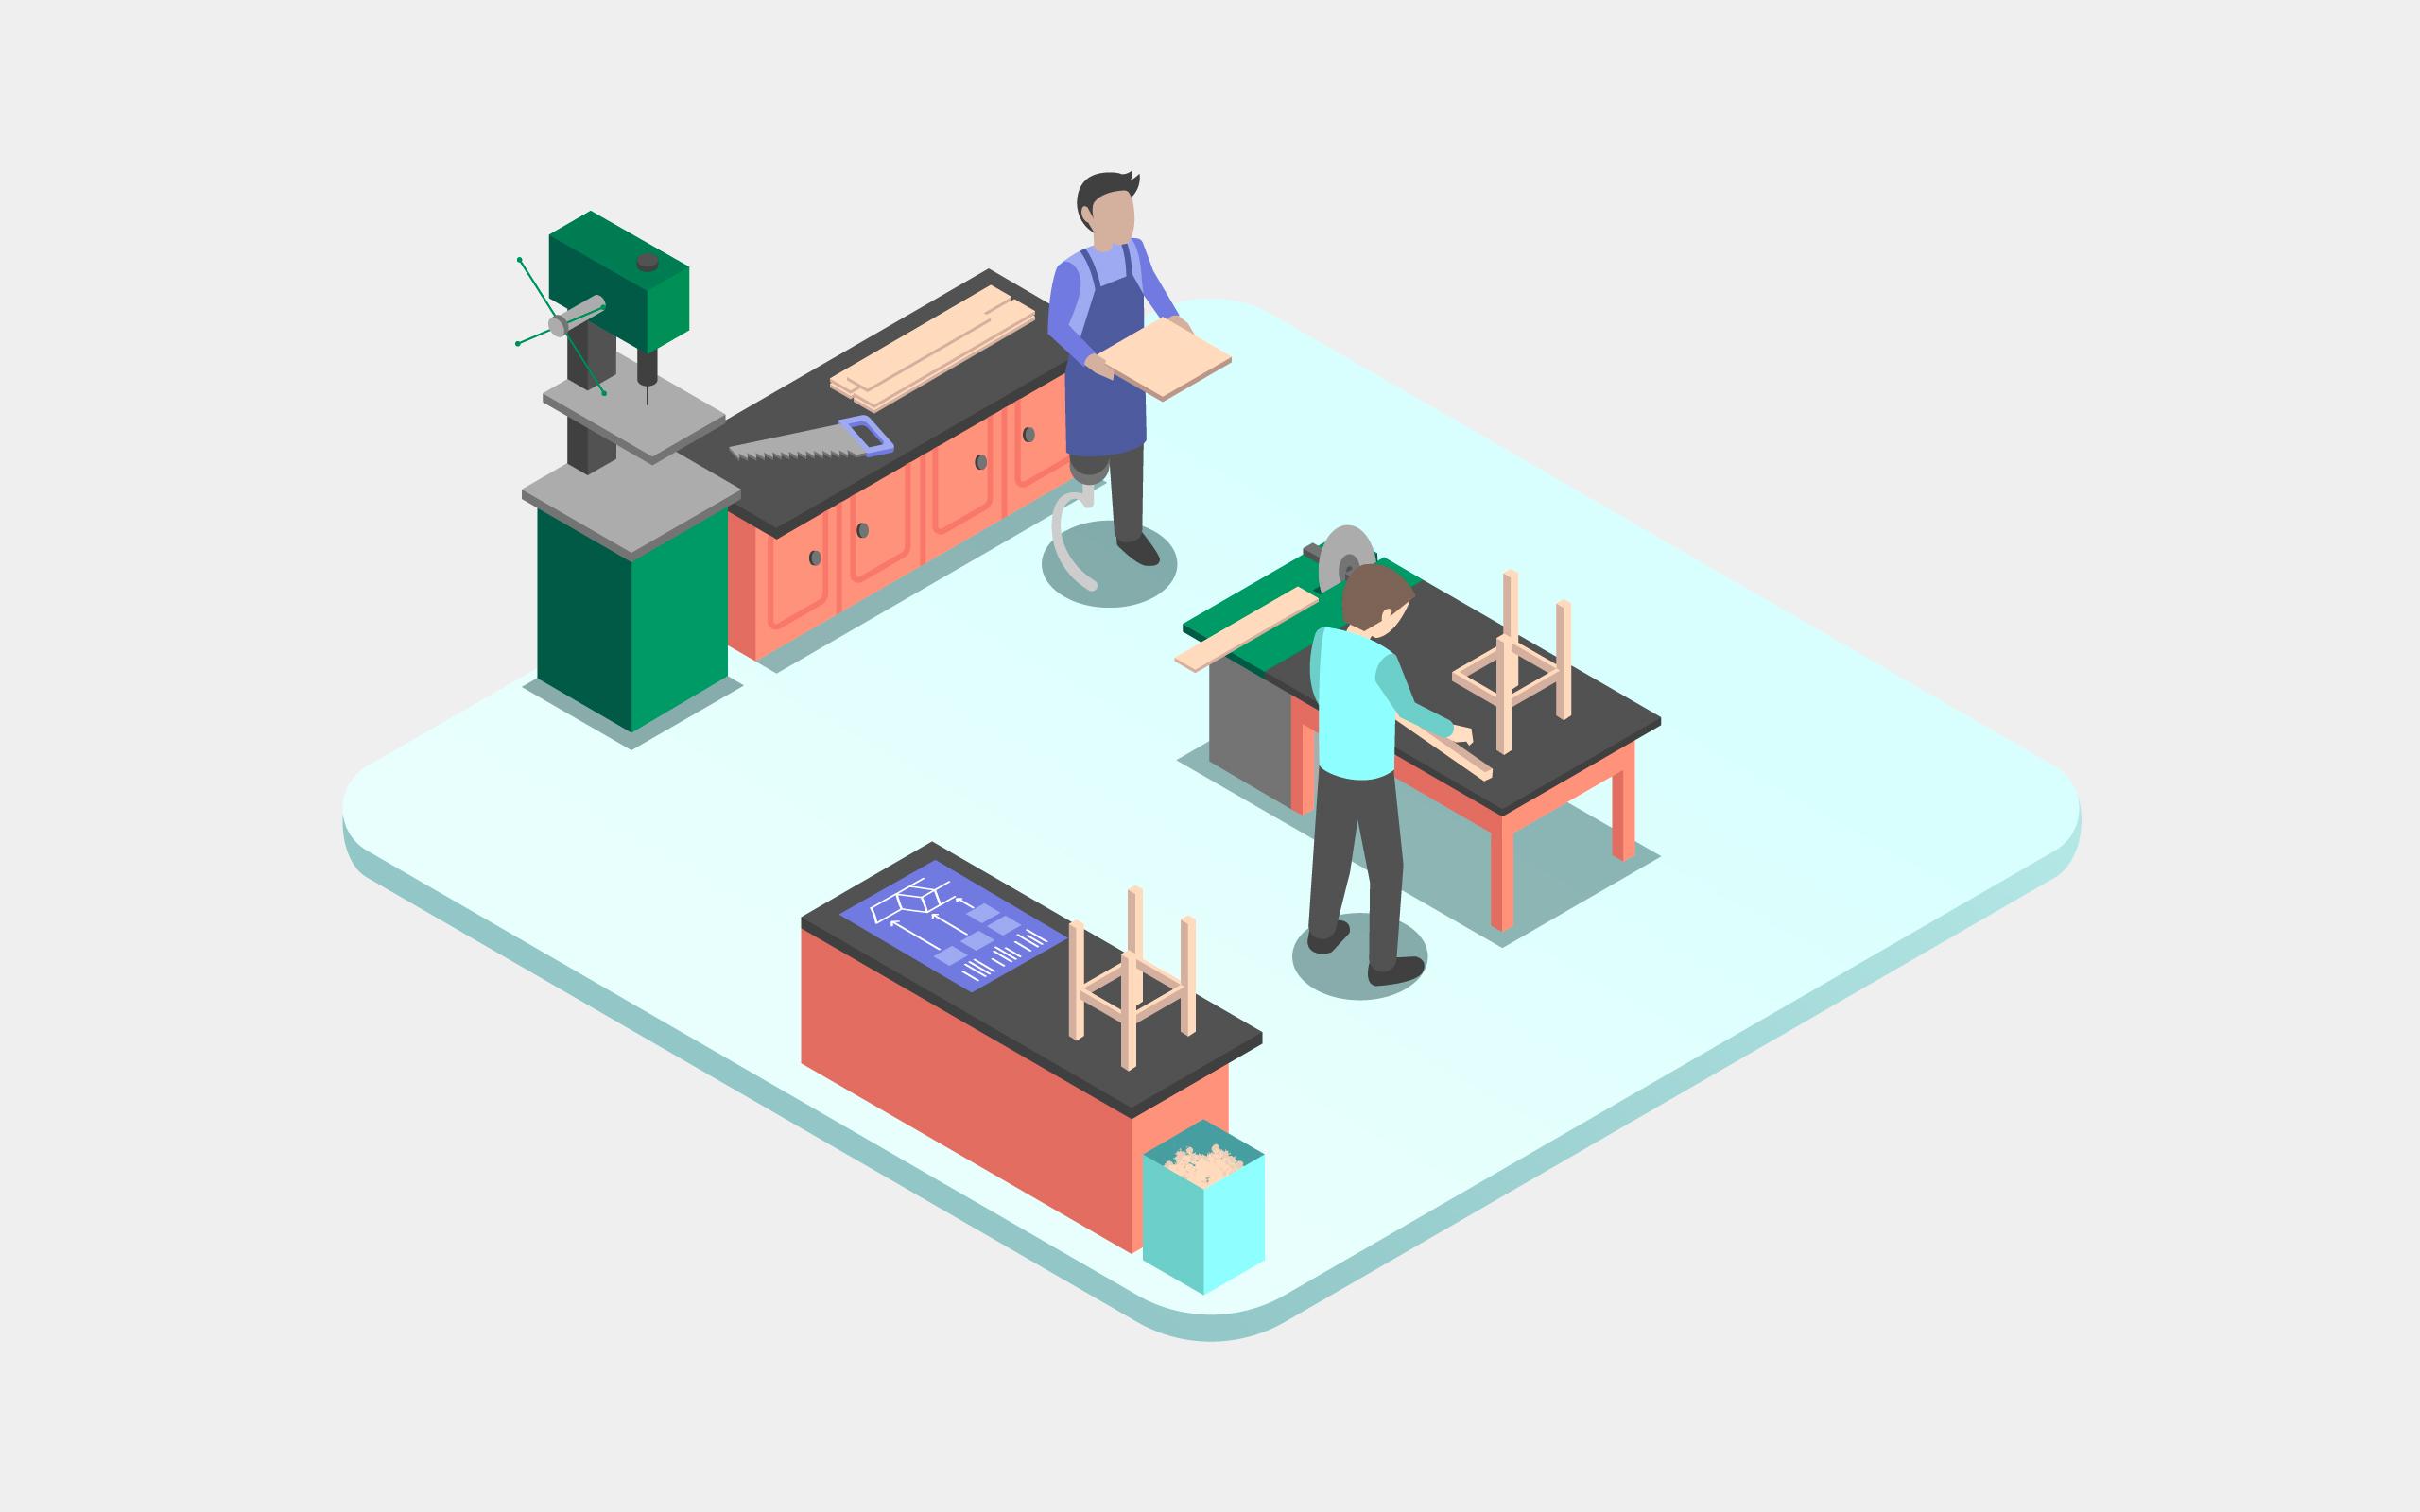 BAGüS – Illustrationswelt und Template-Gestaltung